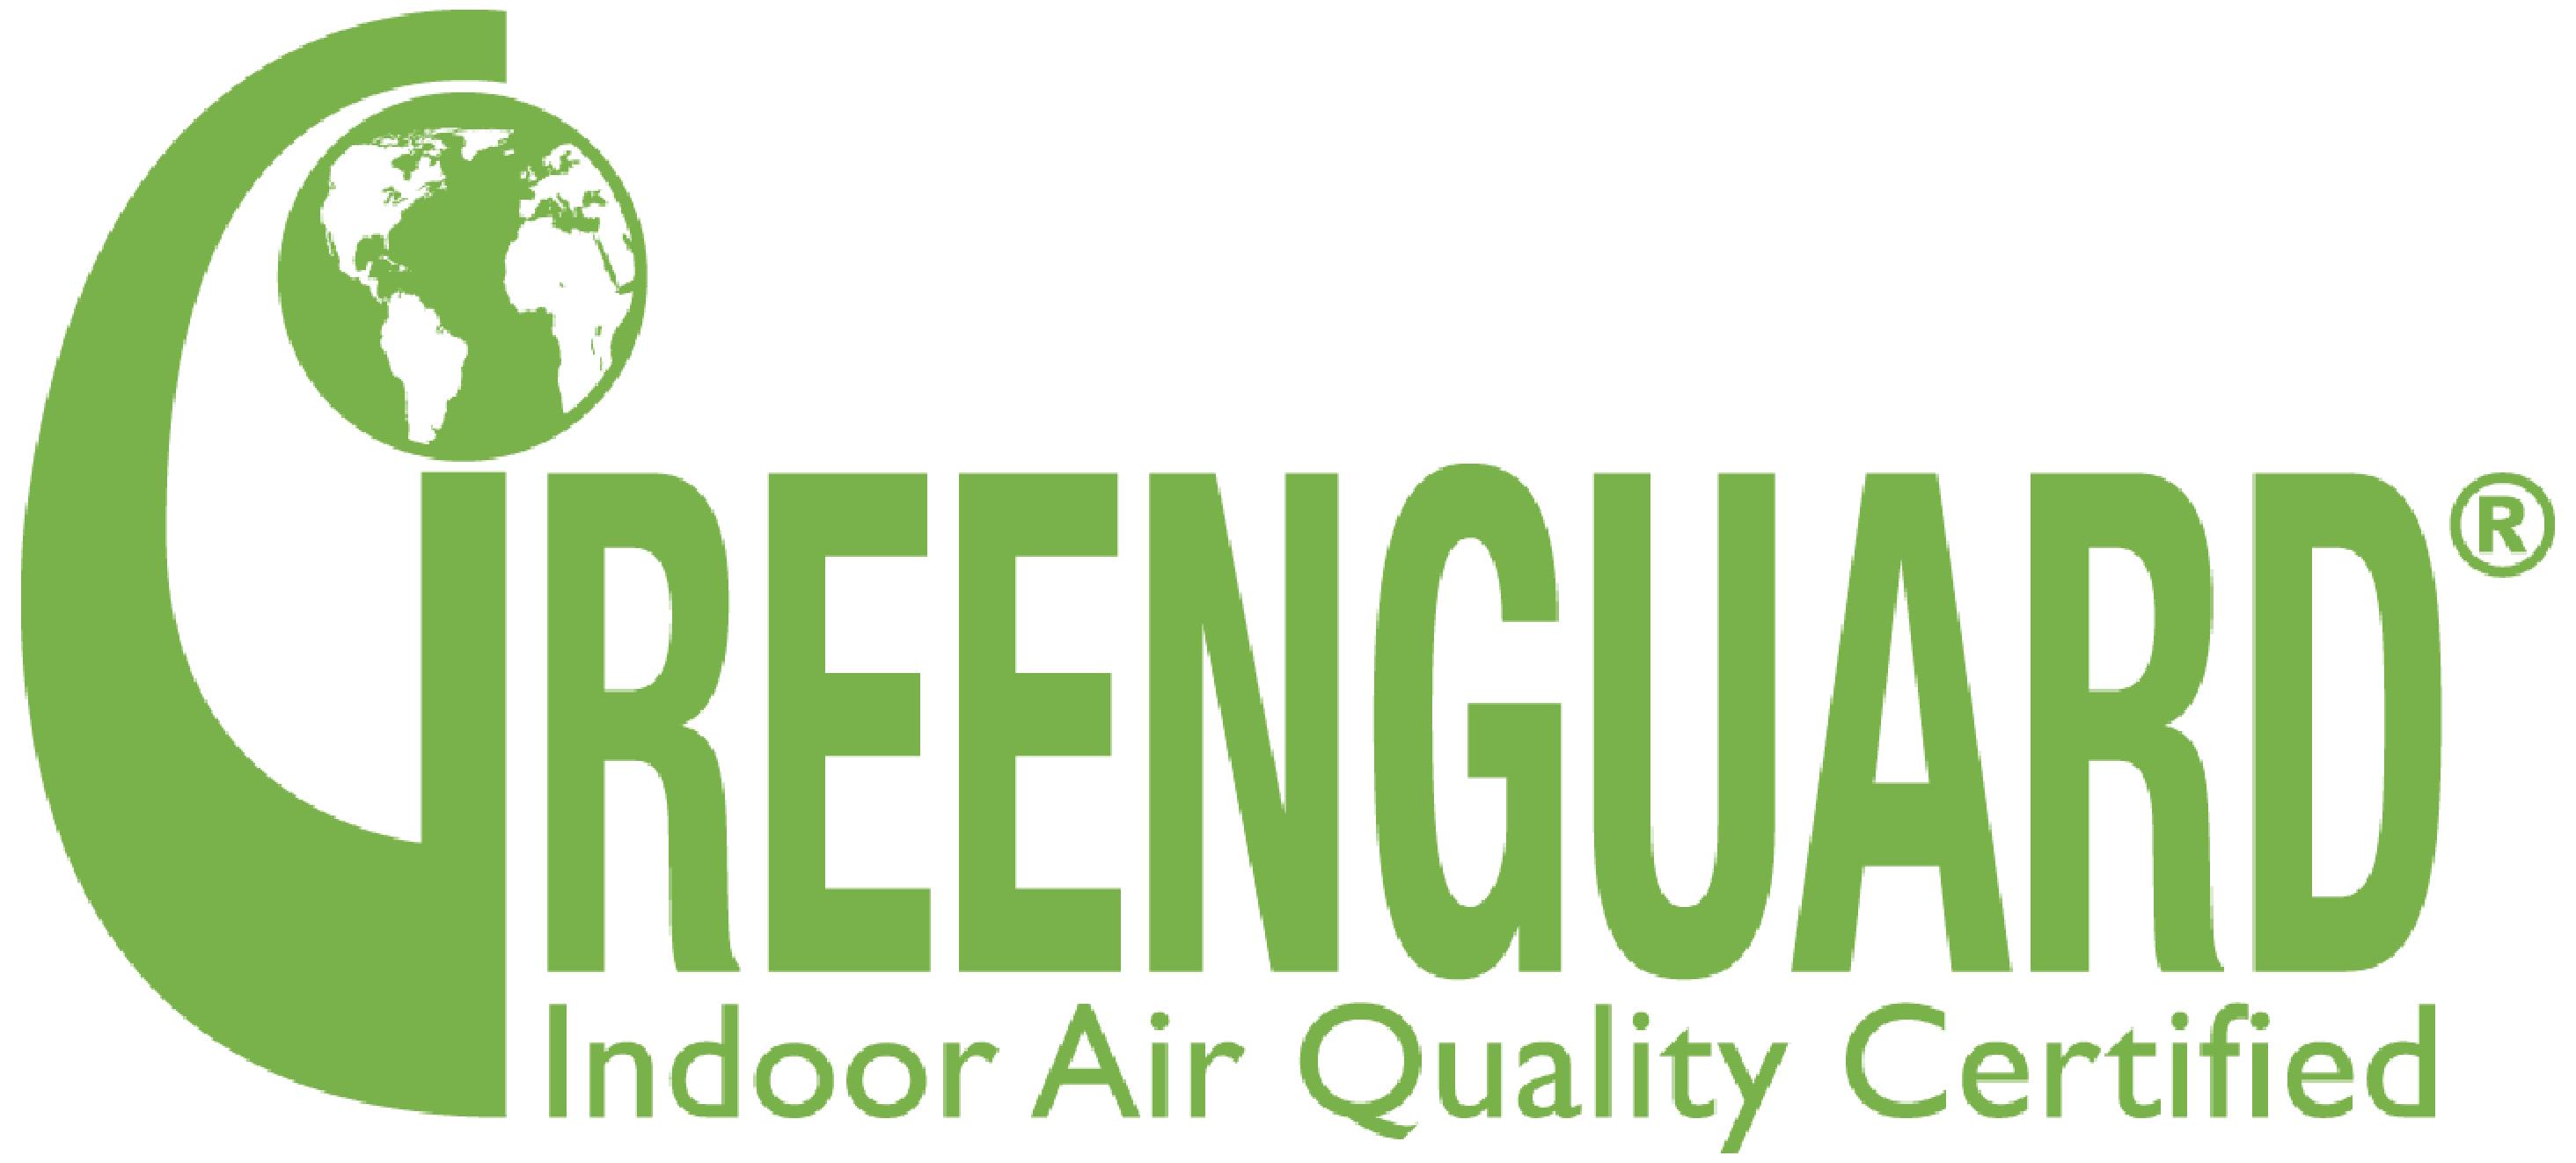 environmental greenguard